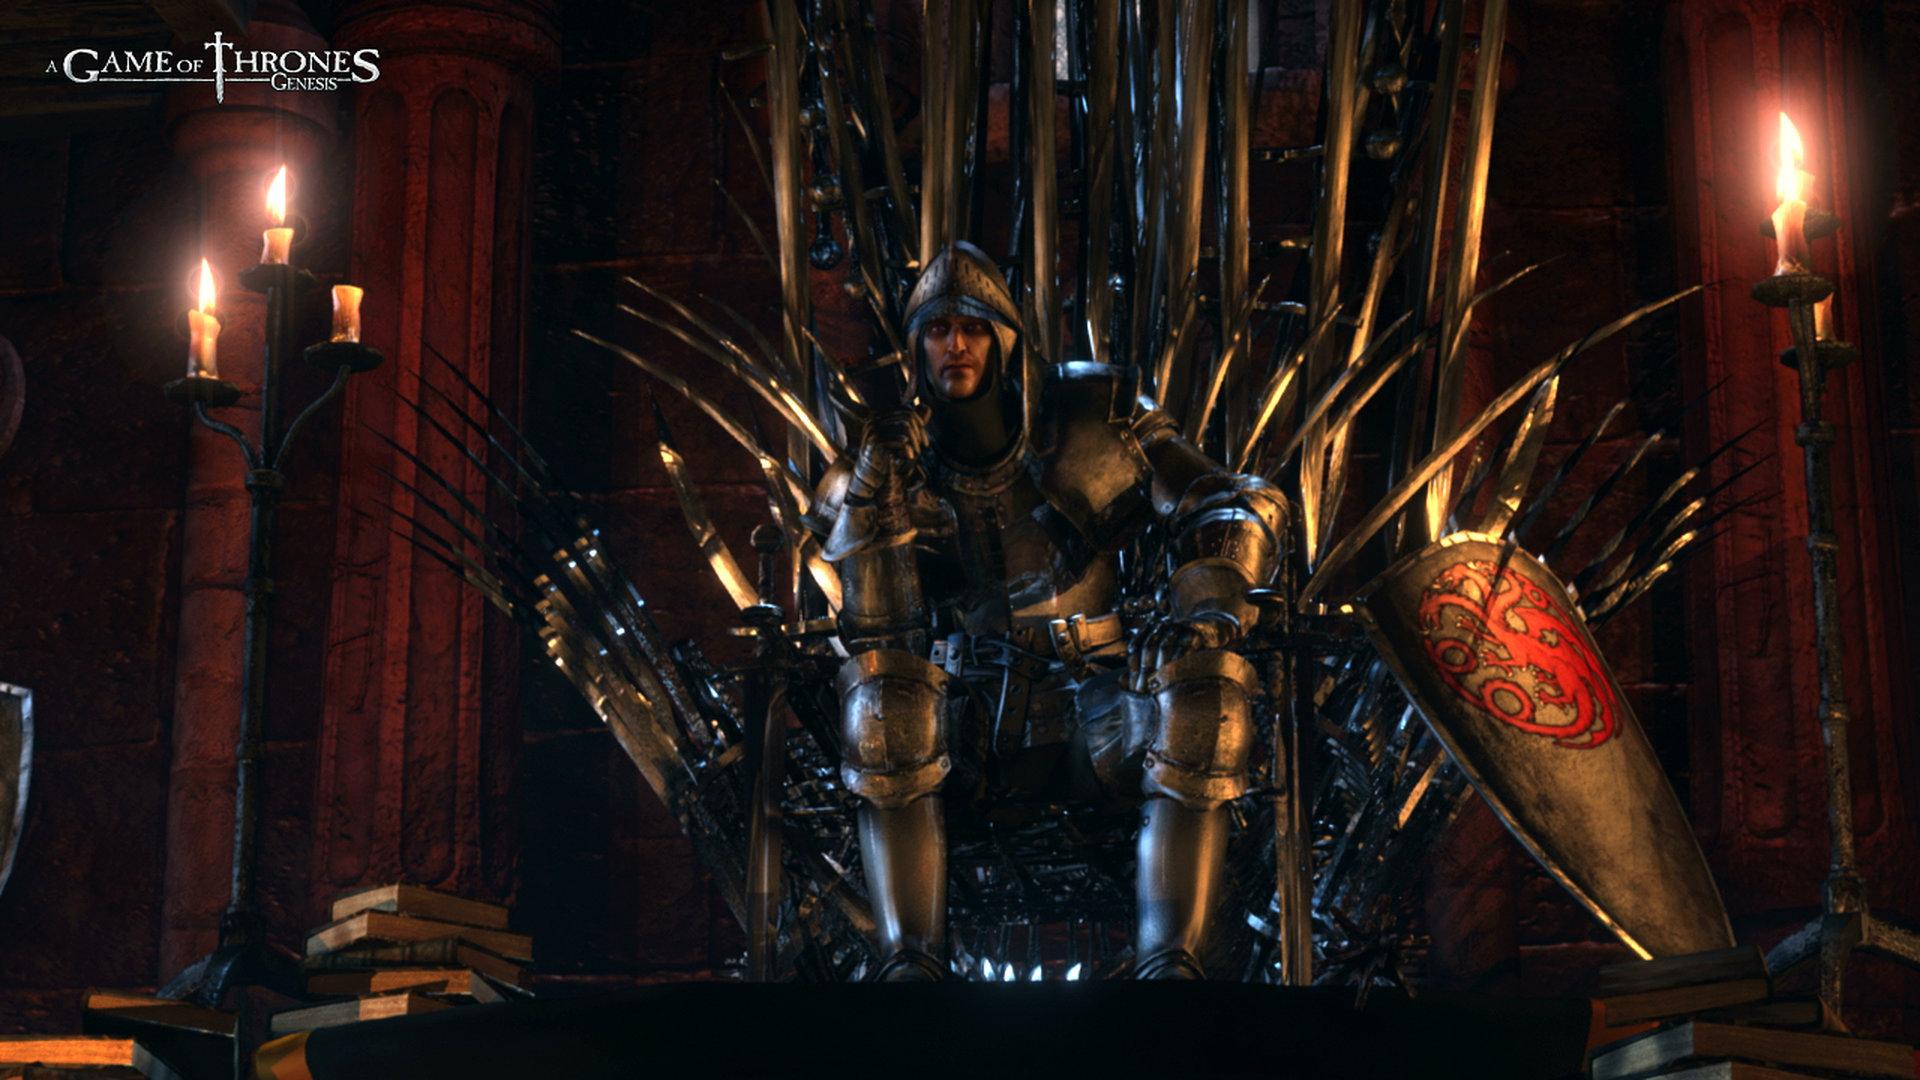 A Game Of Thrones Genesis Gamezroomx